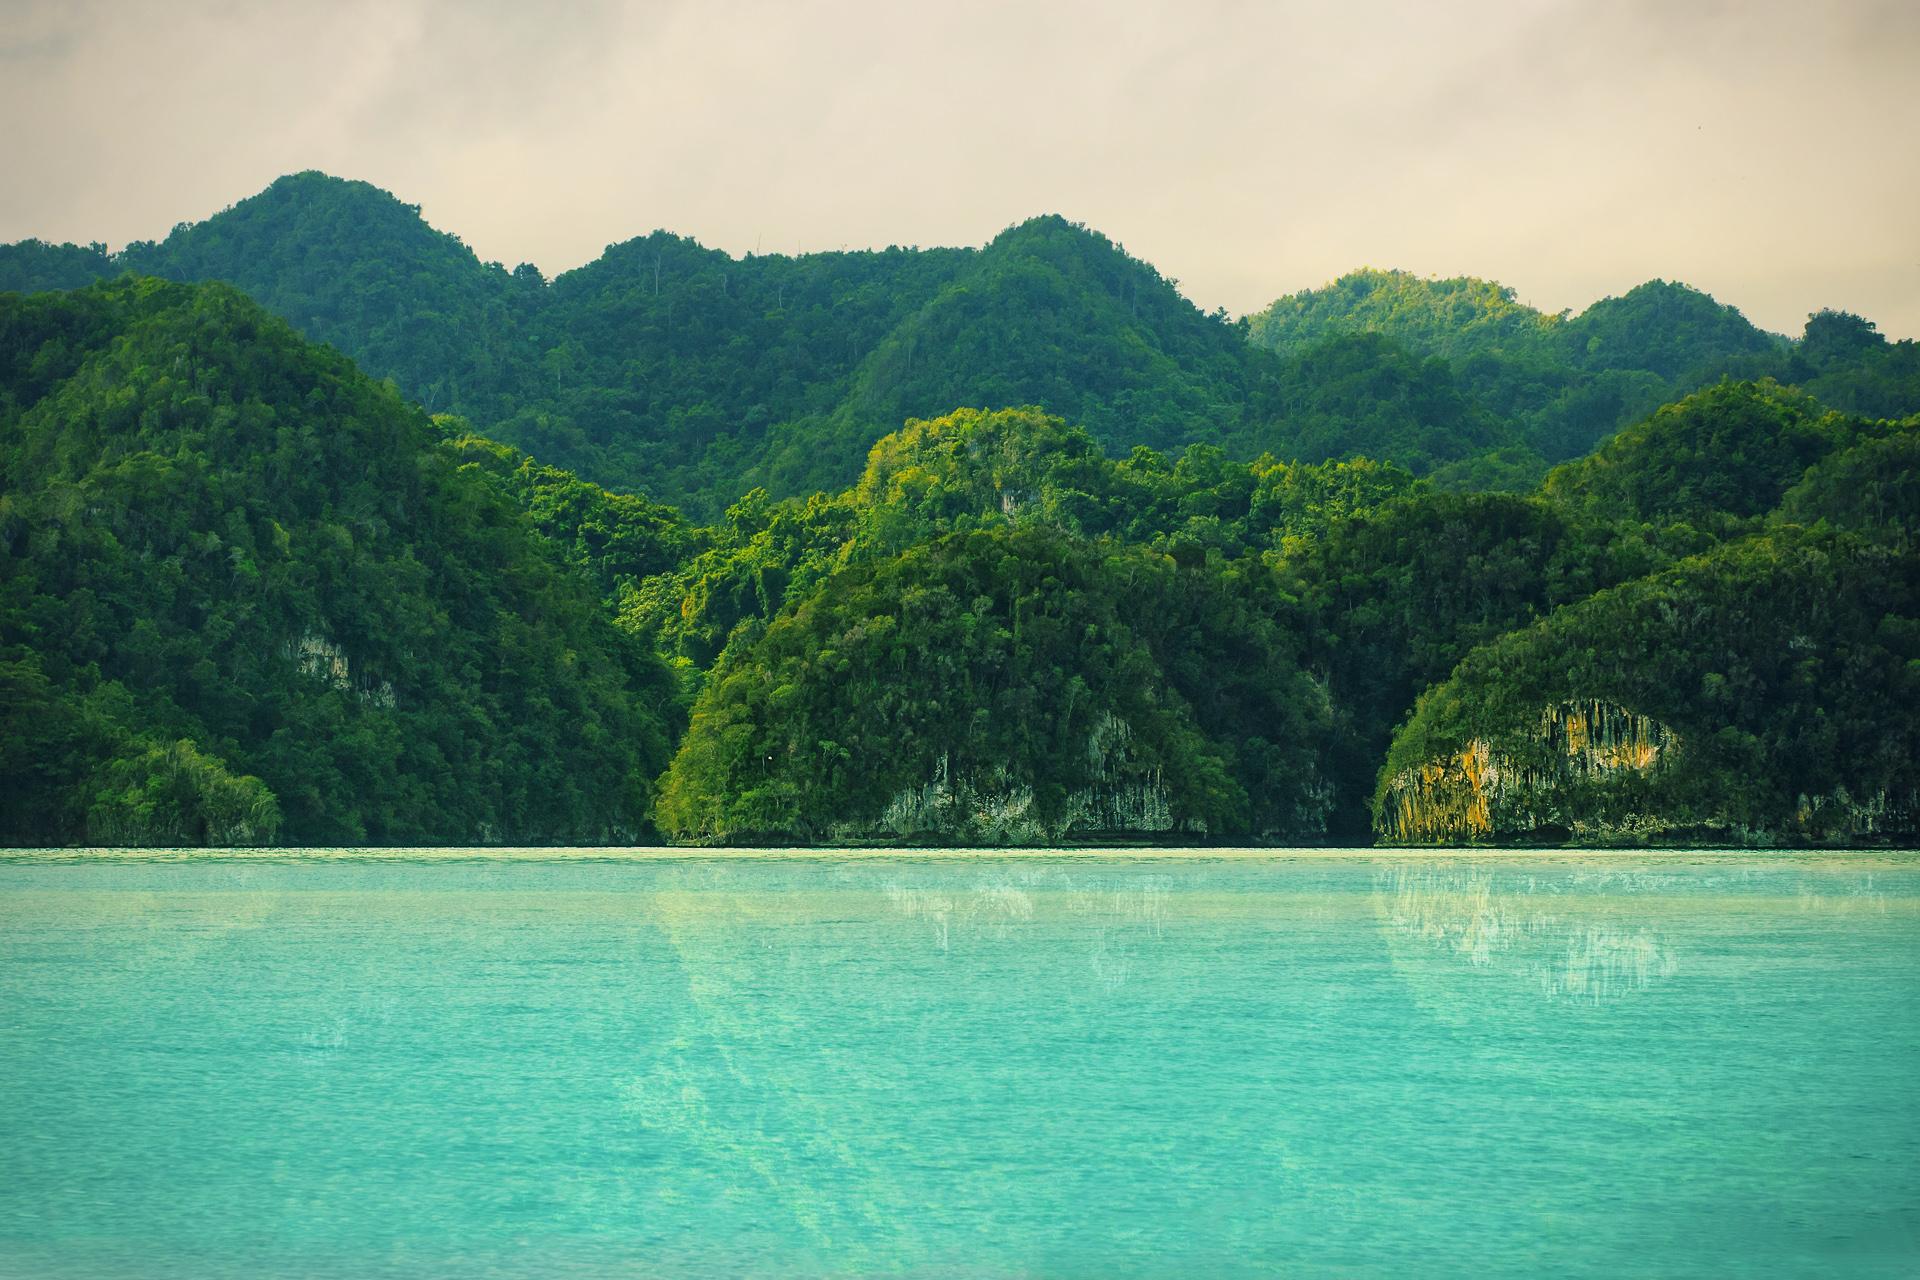 Depiction of Parque nacional Los Haitises